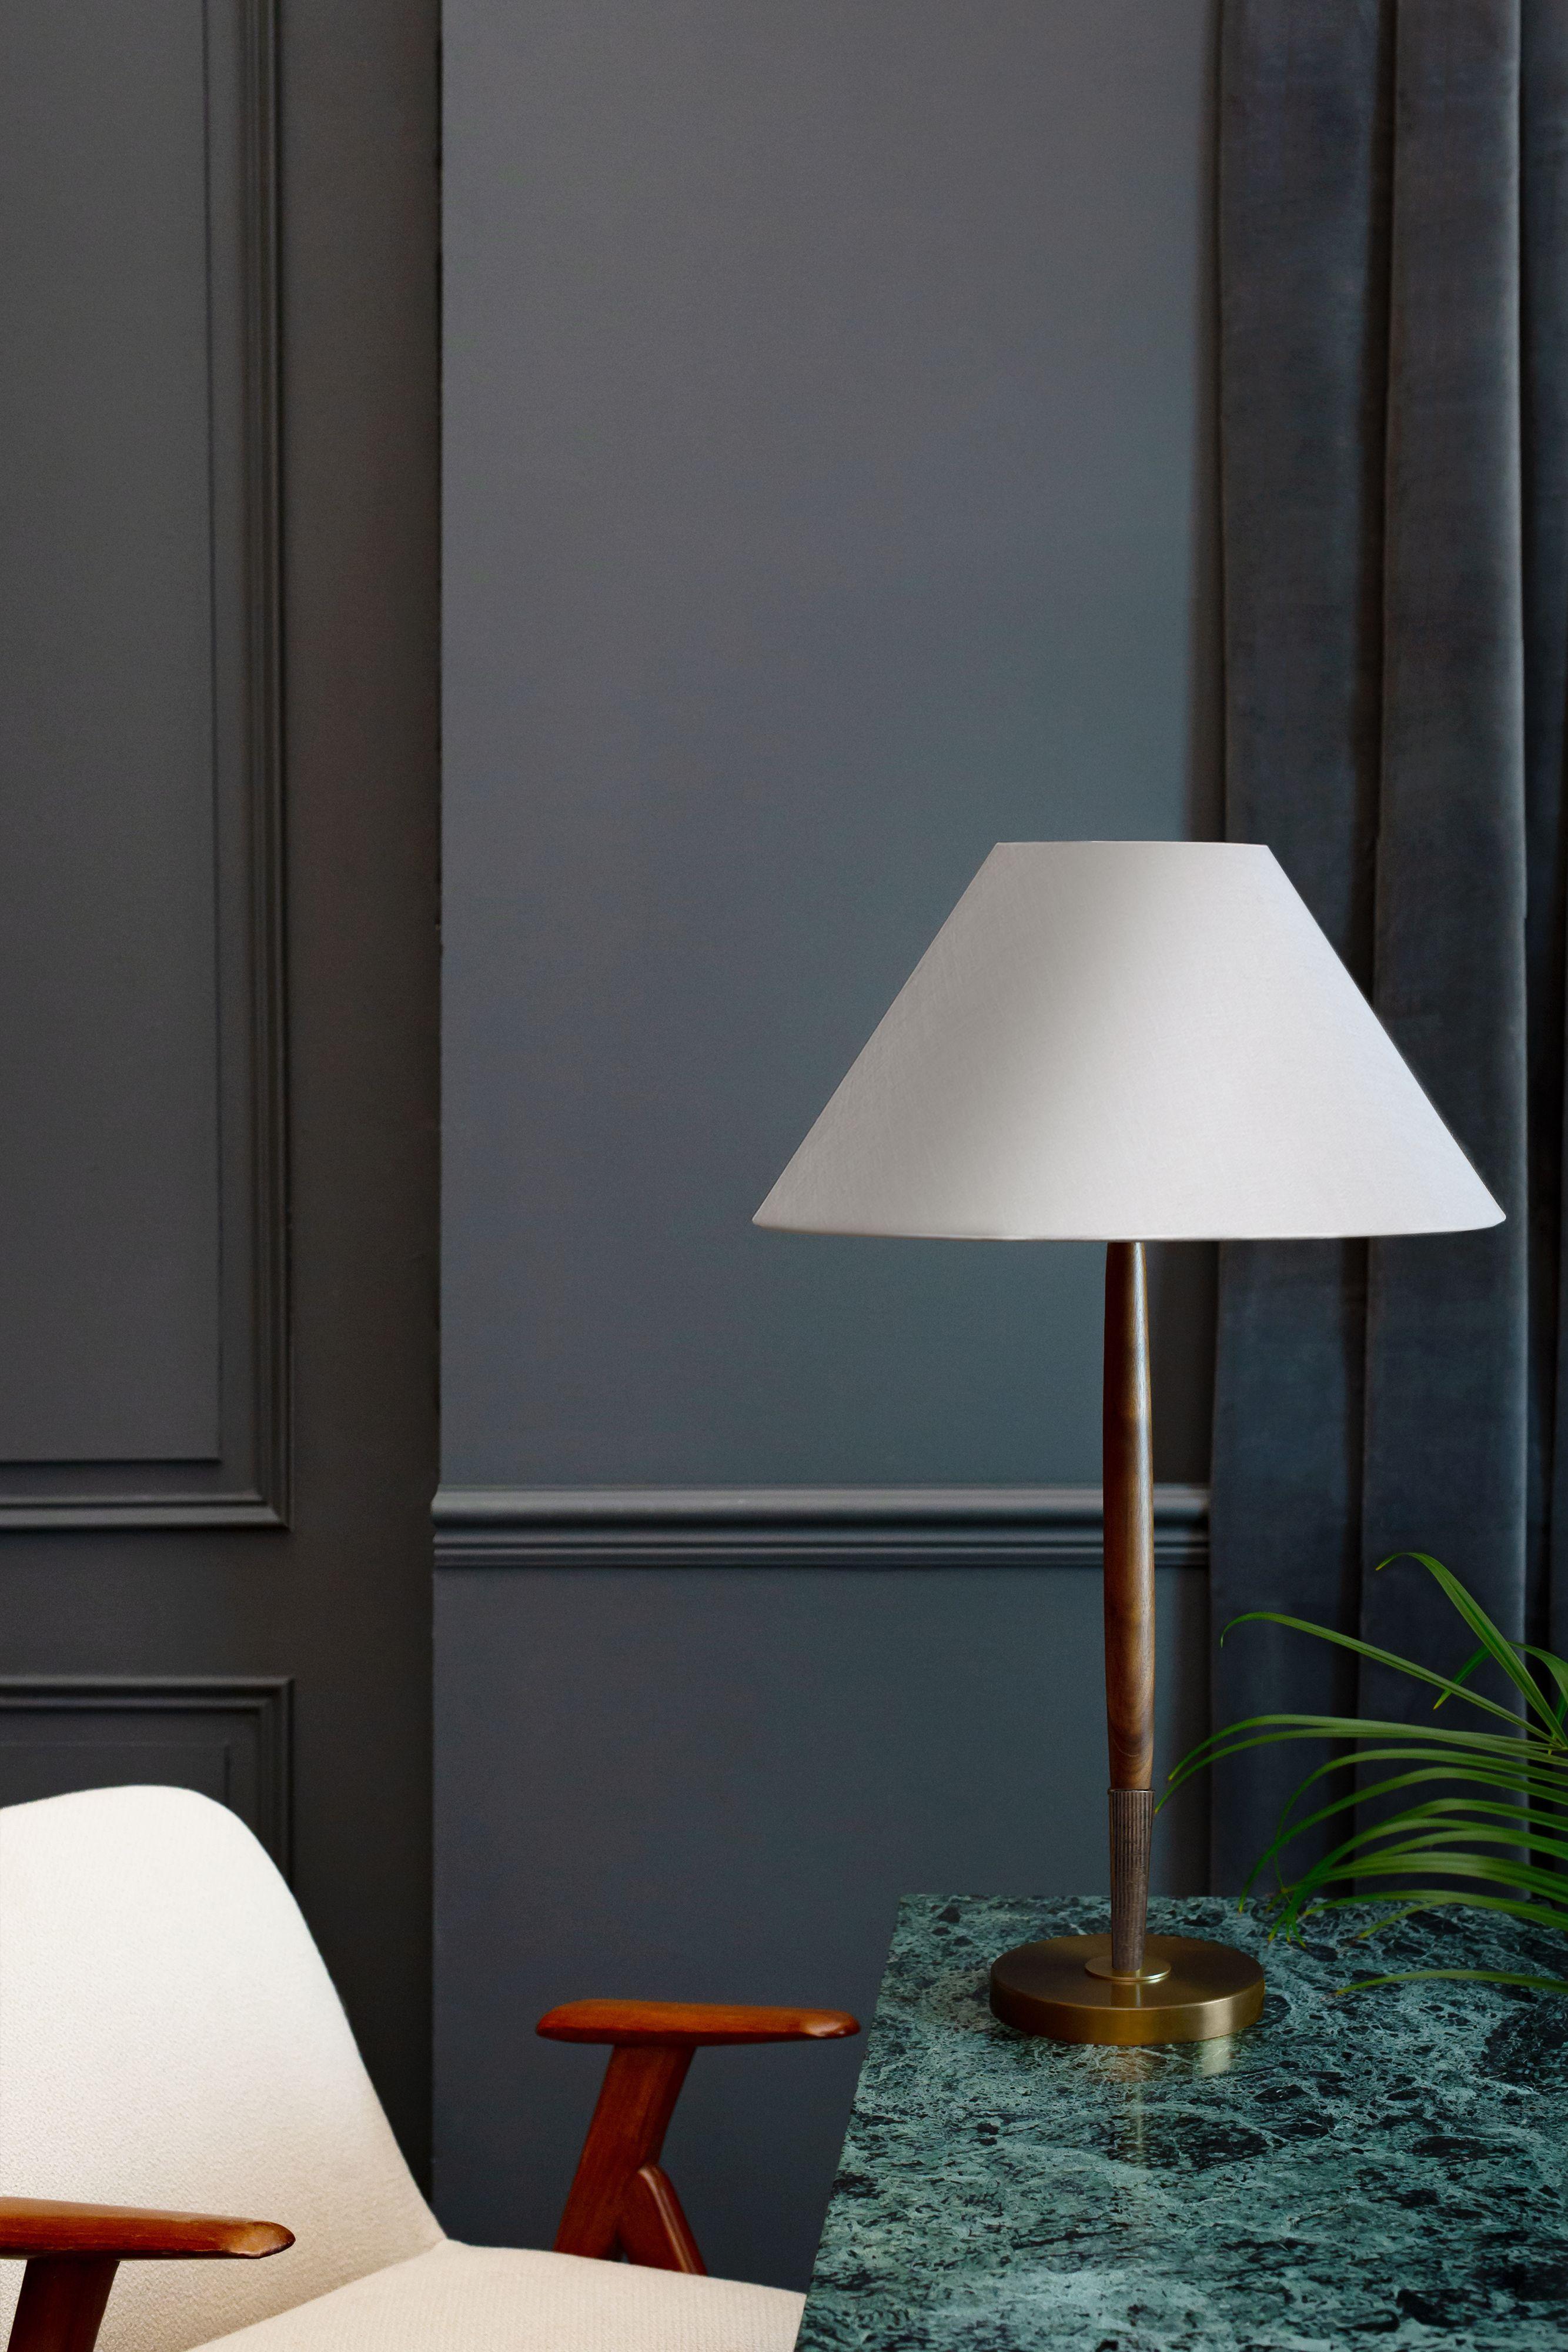 Living Room Reading Lights Table Lamp Modern Bedside Table Floor Lamp Design #tall #living #room #table #lamps